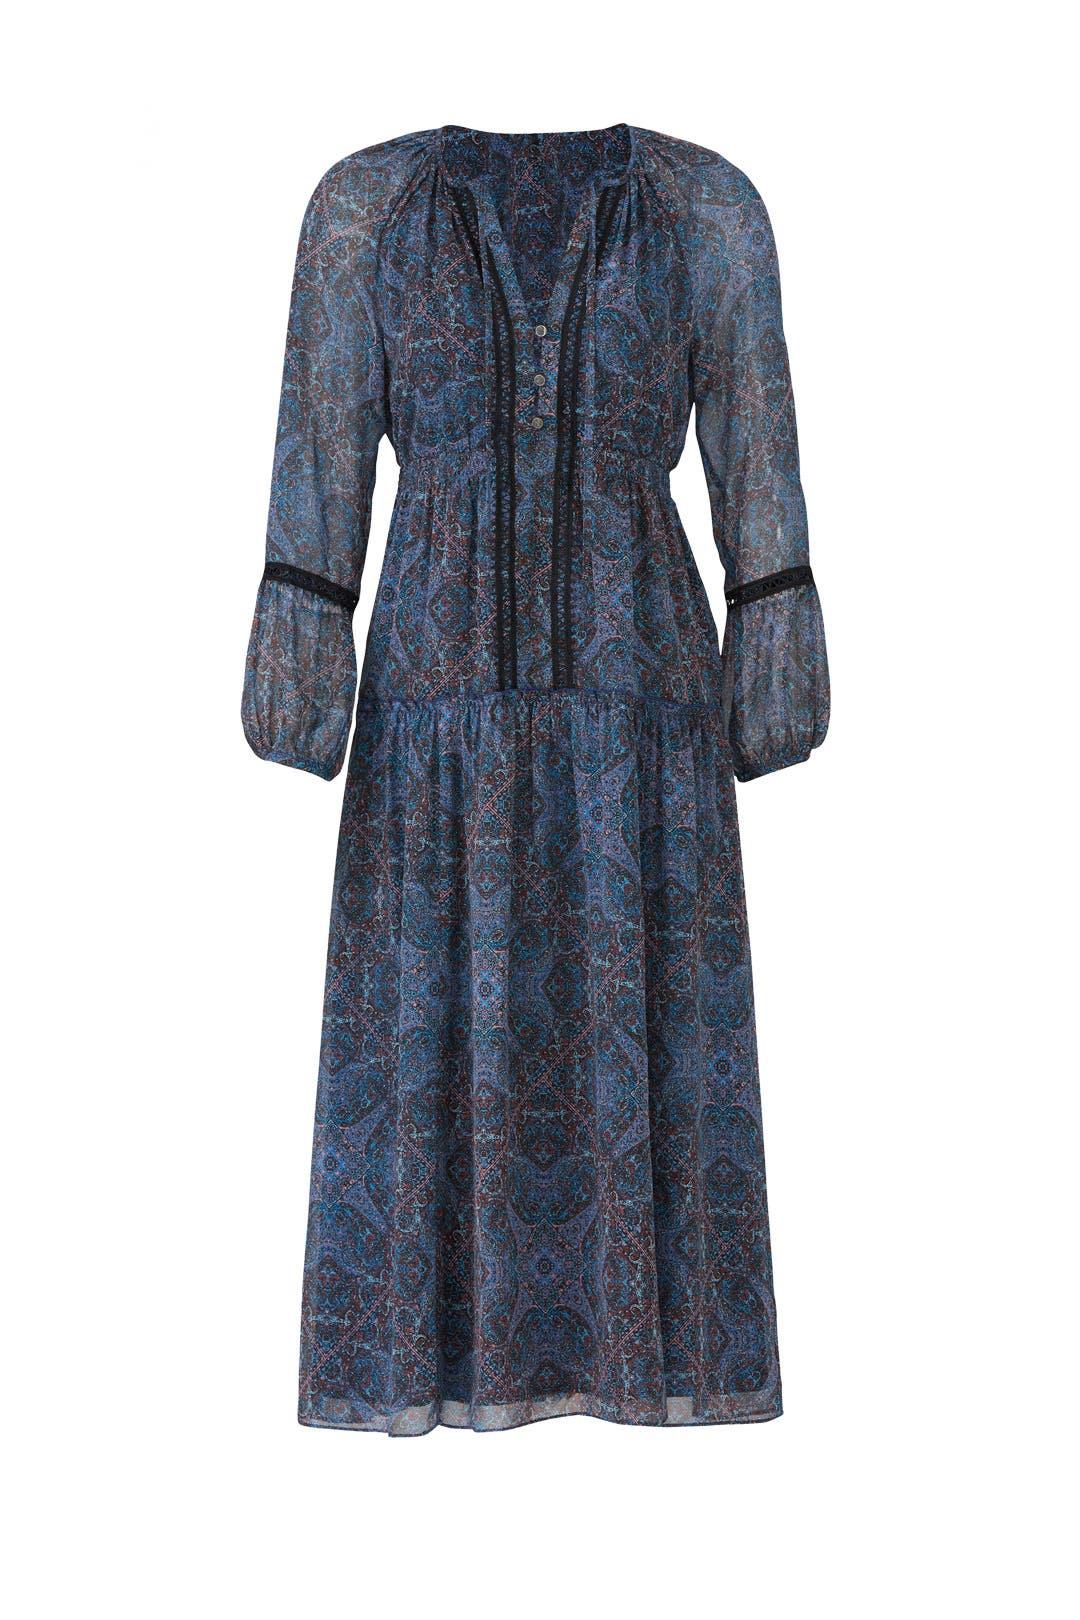 Monarch Handkerchief Dress By Ella Moss For 40 Rent The Runway